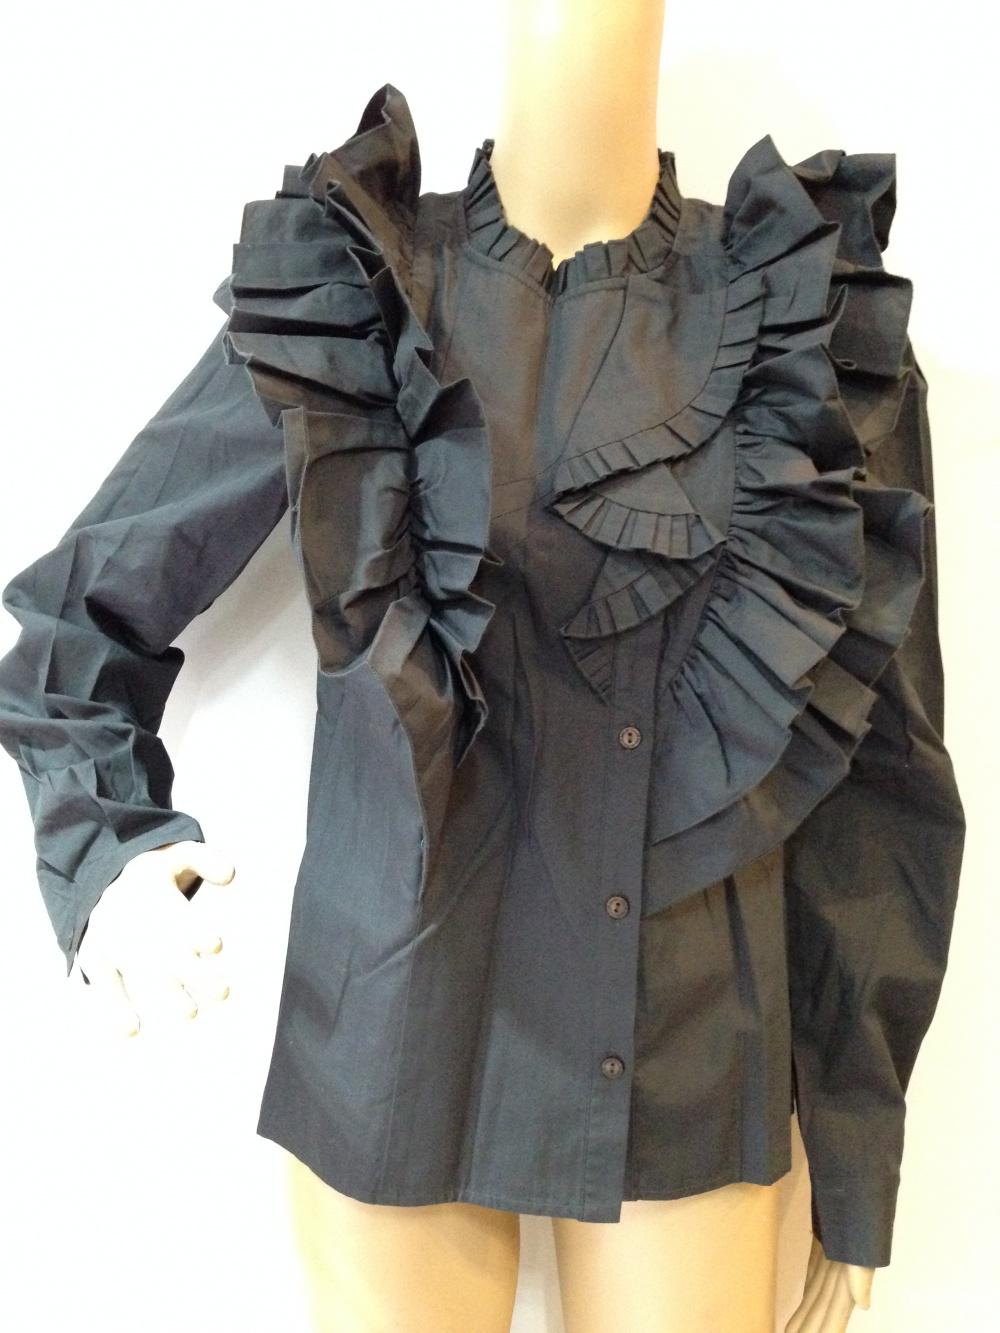 Шикарная брендовая блузка-рубашка от Chloe р.44